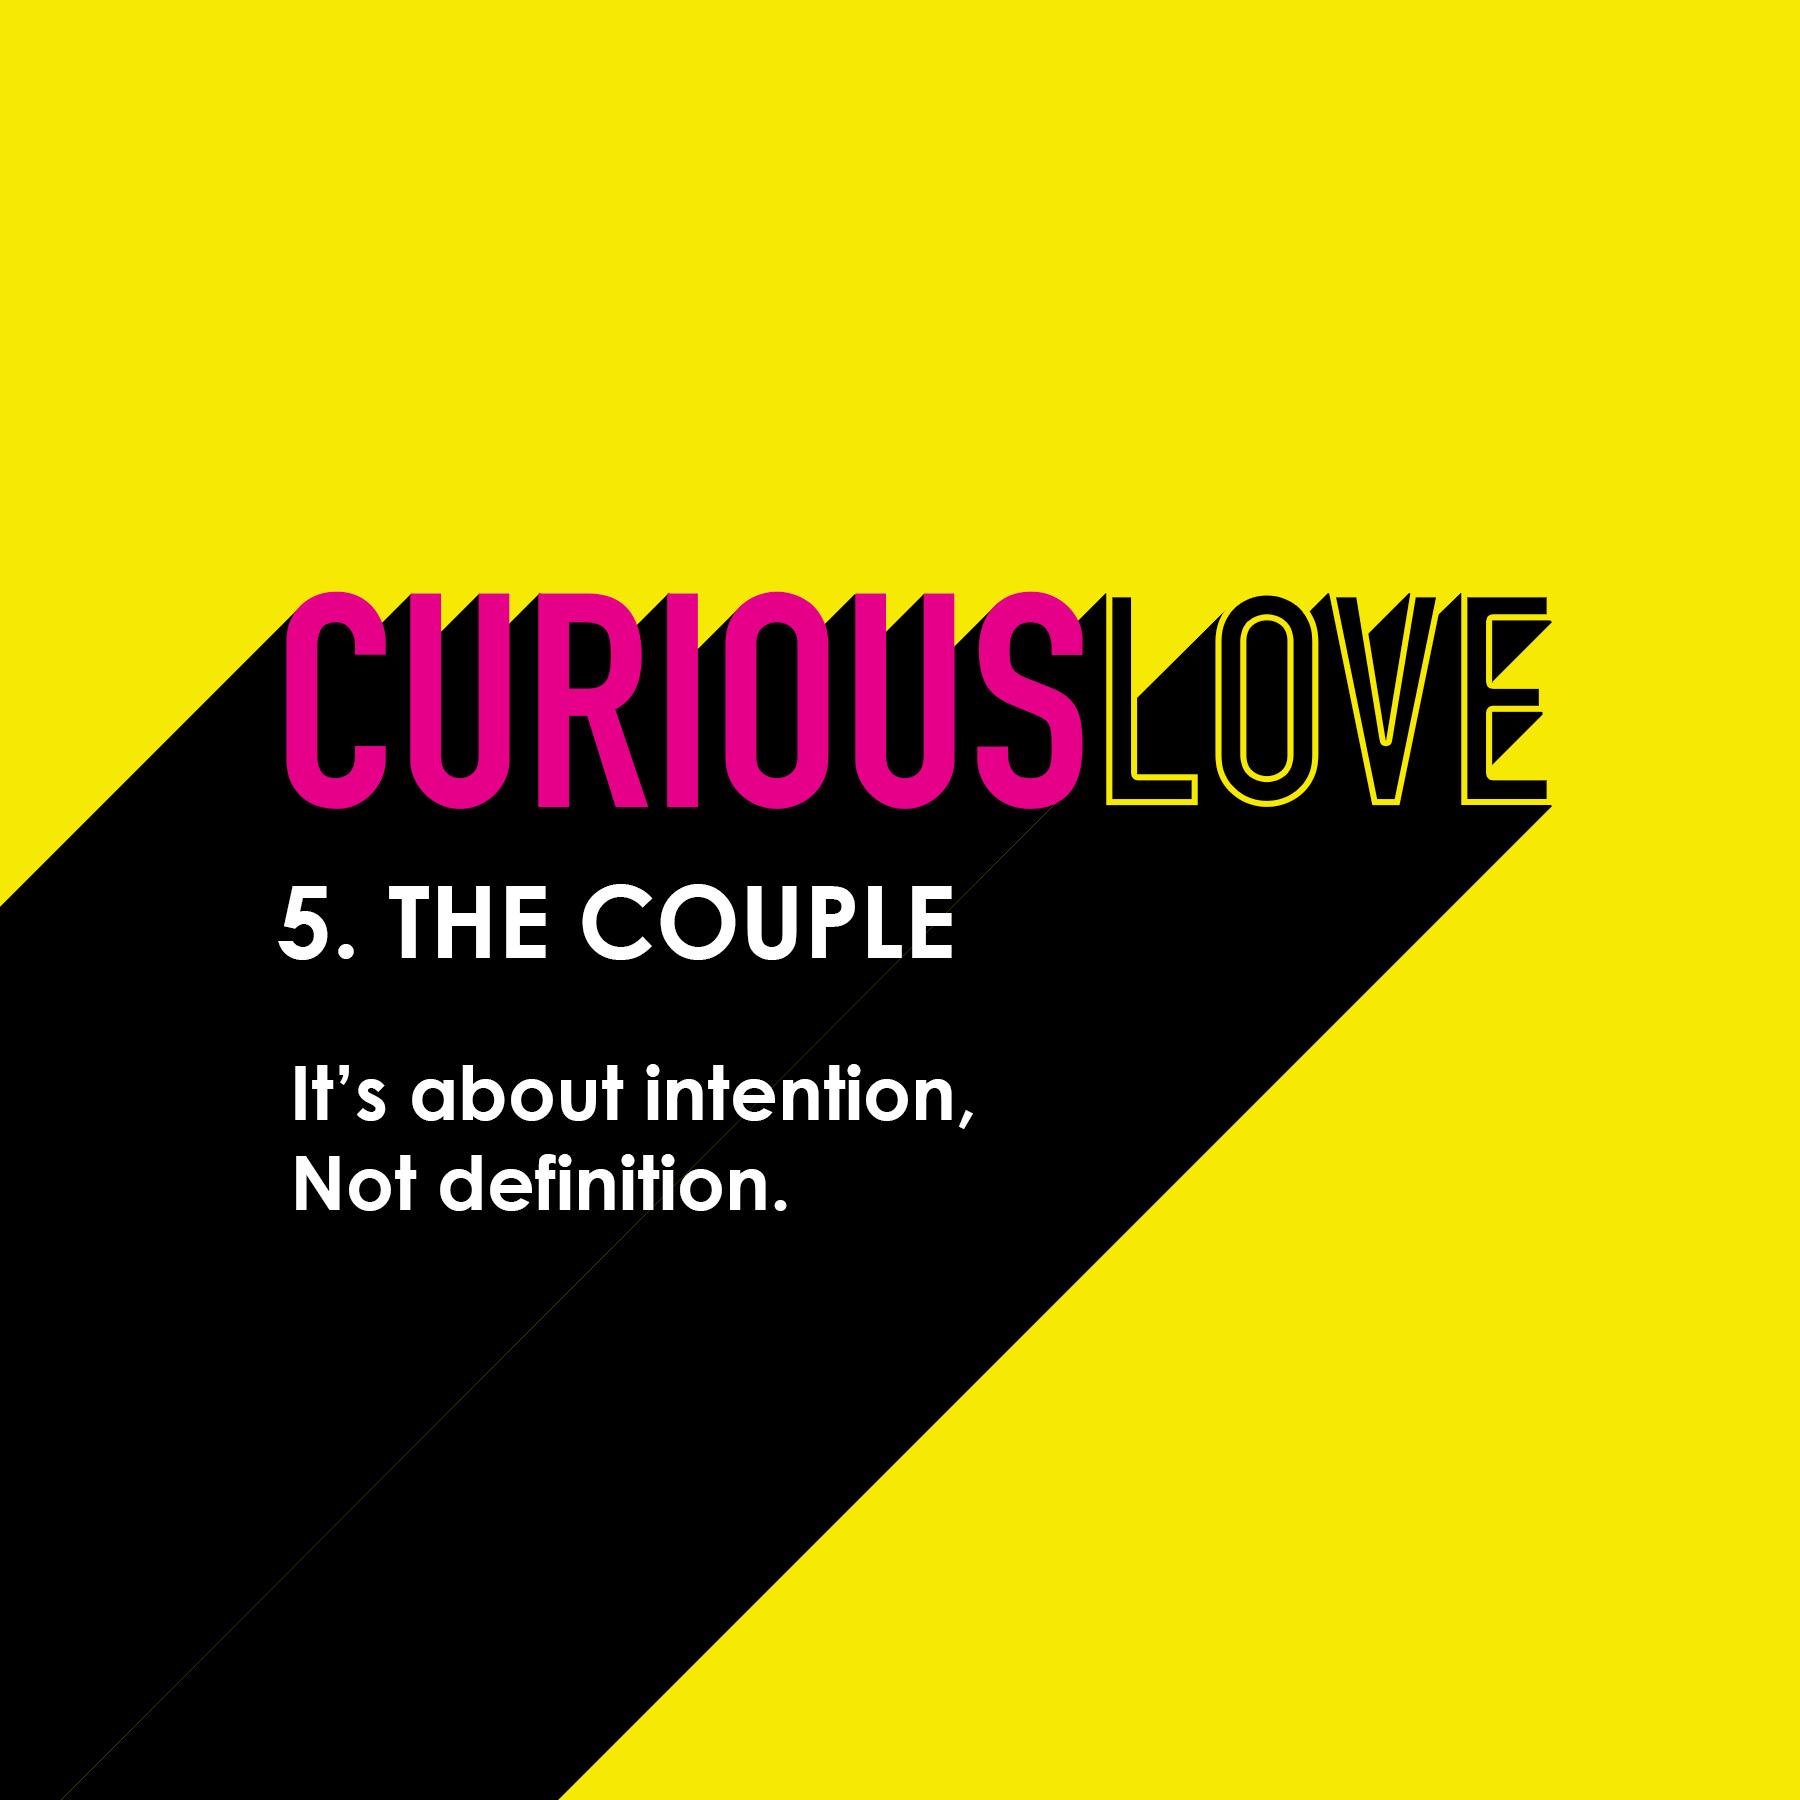 CuriousLove Episode Tagline 5.jpg